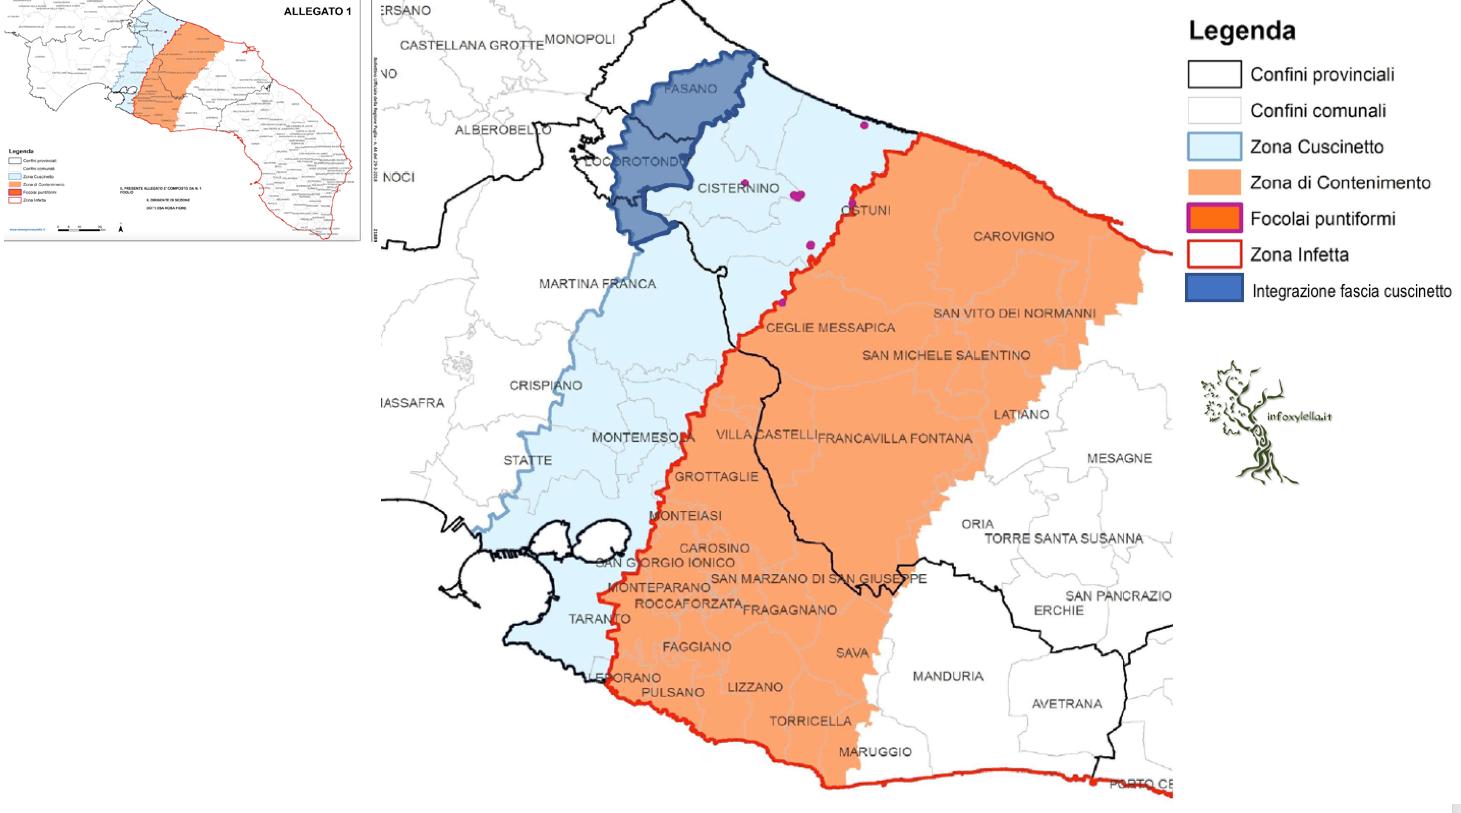 xylella buffer zone expands northward into bari province